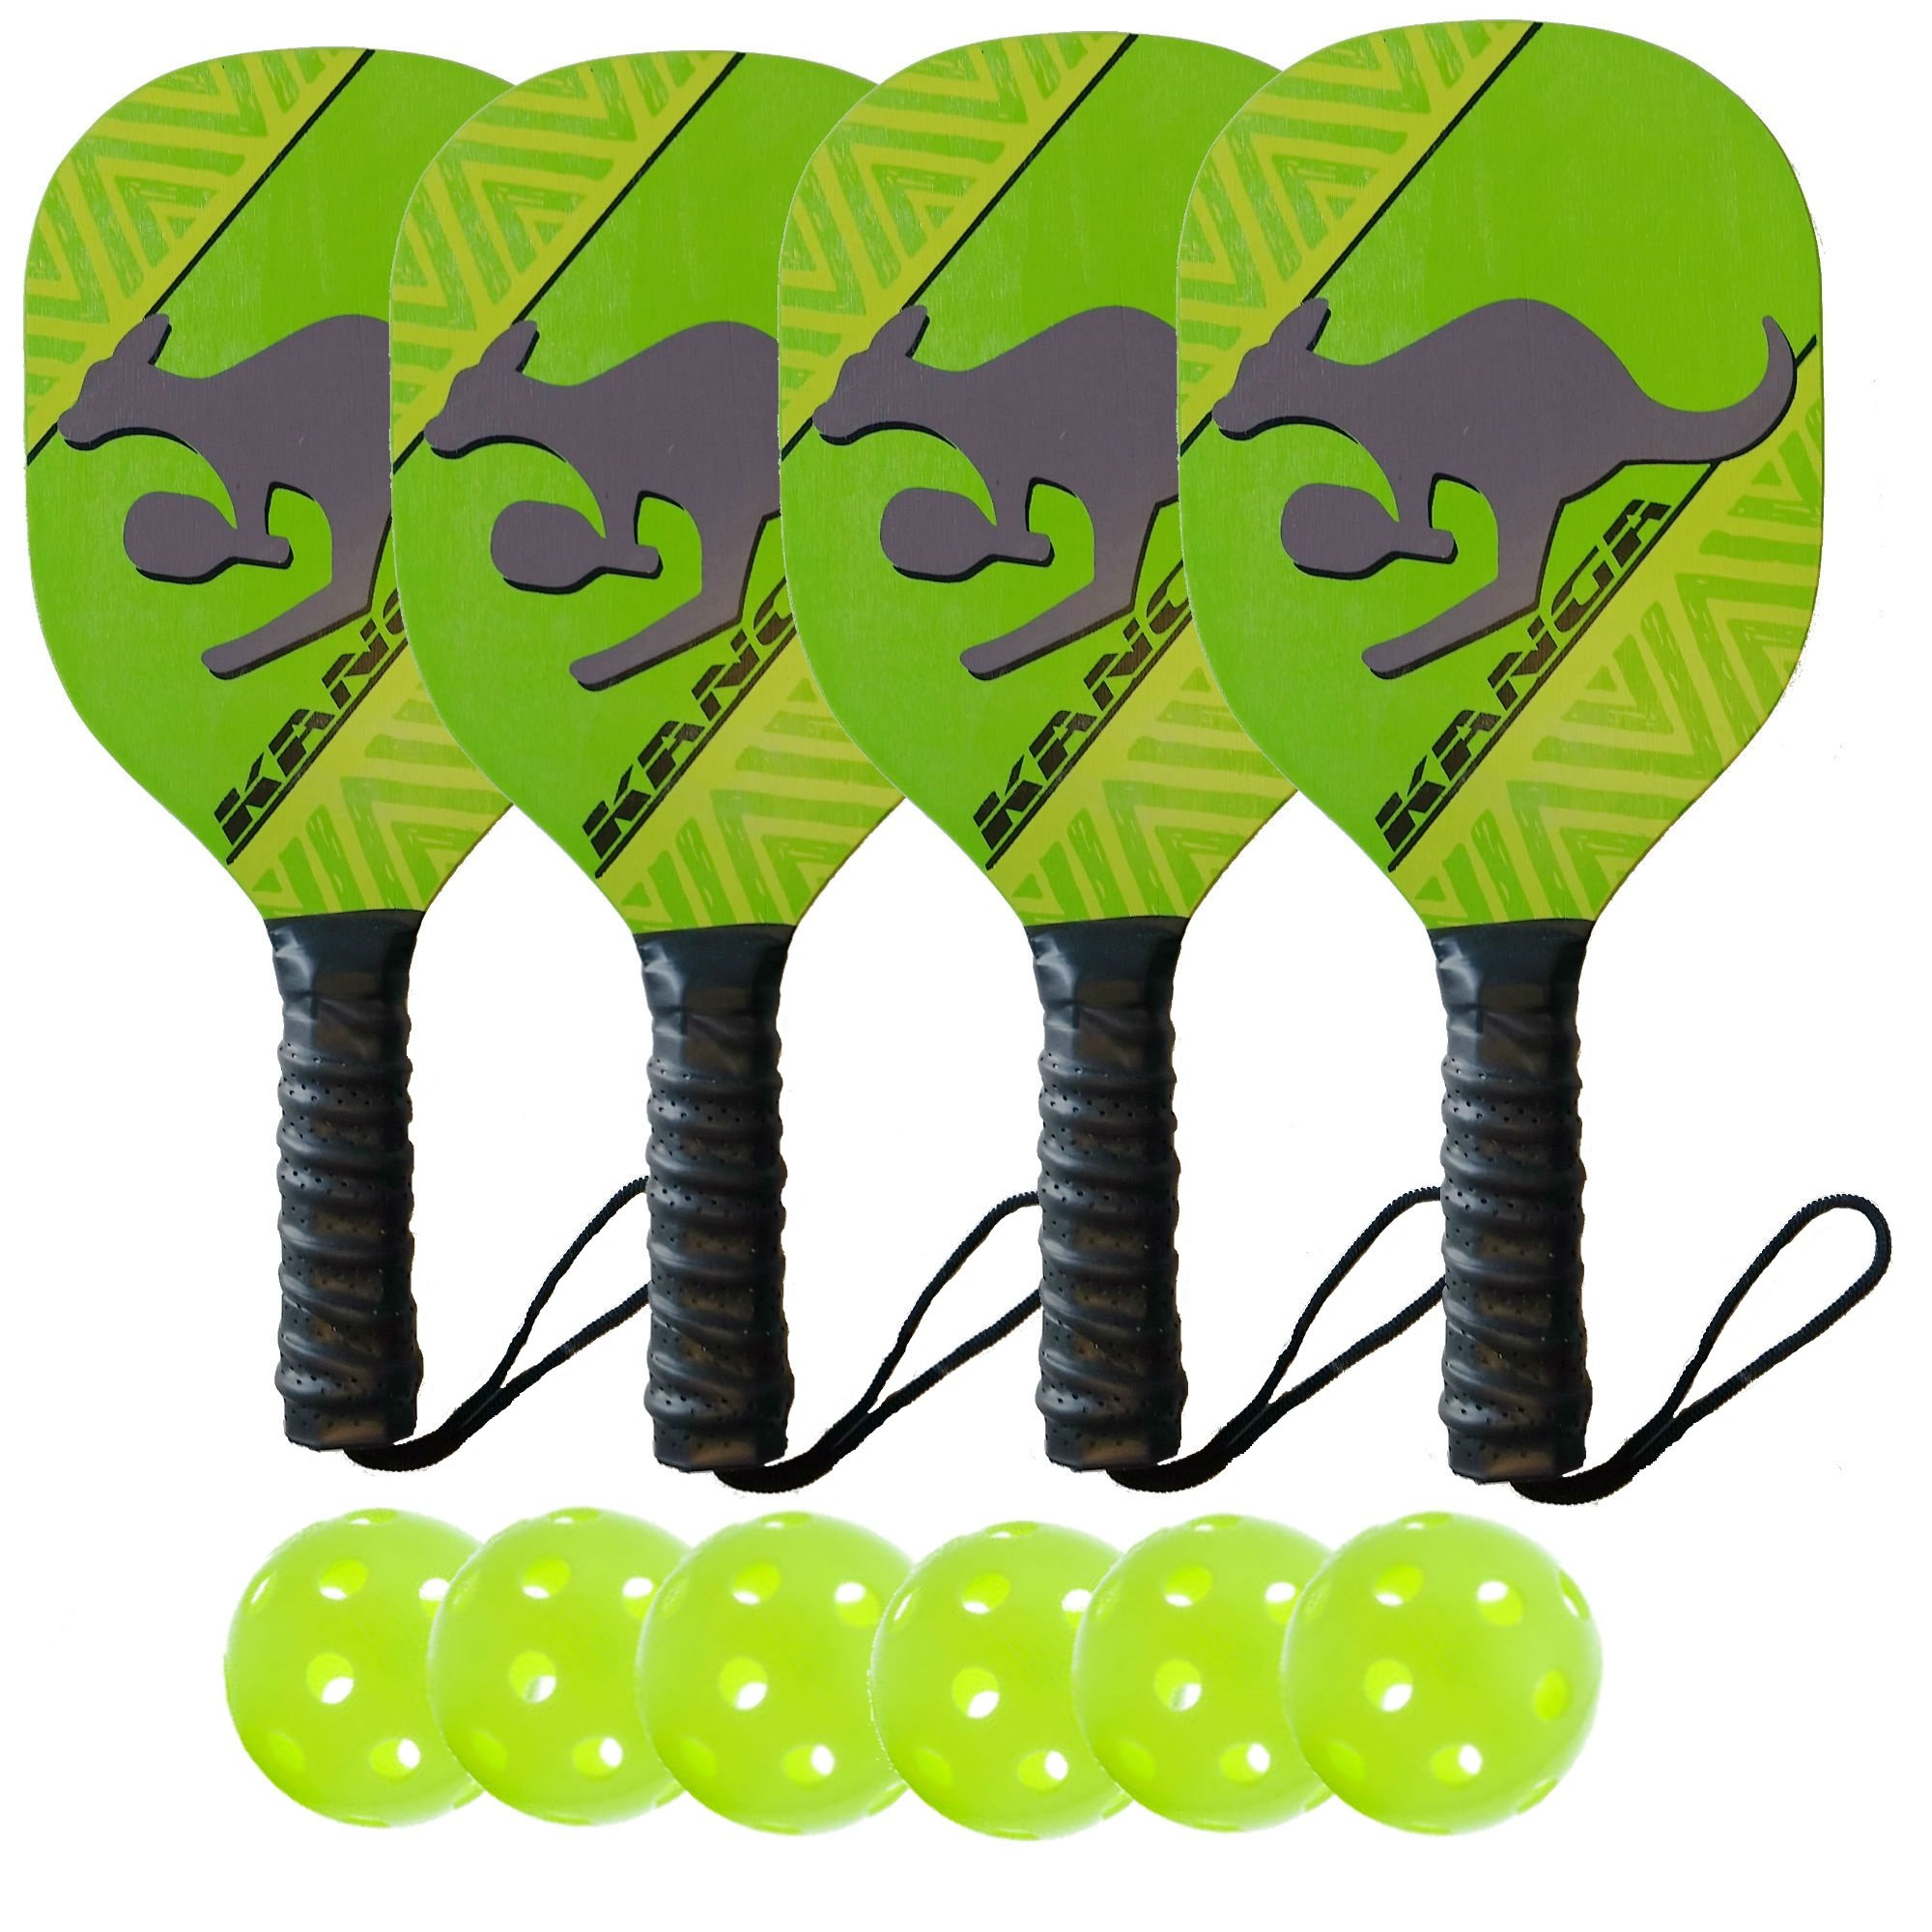 Kanga Beginner Pickleball Paddle Bundle | Set Includes 4 Pickleball Paddles/6 Pickleball Balls | Durable Wood Paddle Construction with Comfort Cushion Grip by PickleballCentral